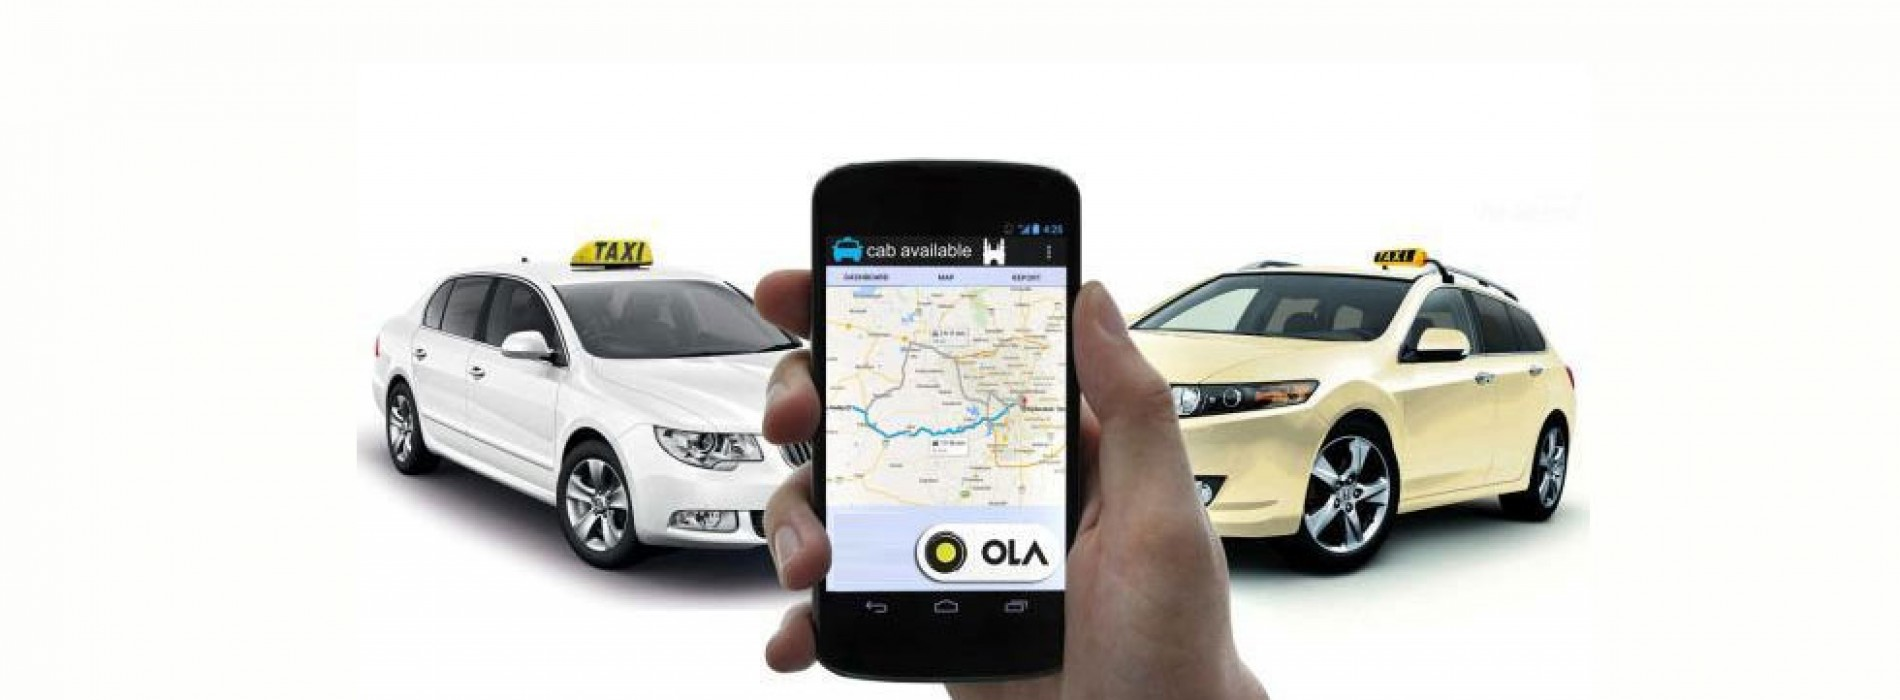 Ola launches more economy cab rides in India